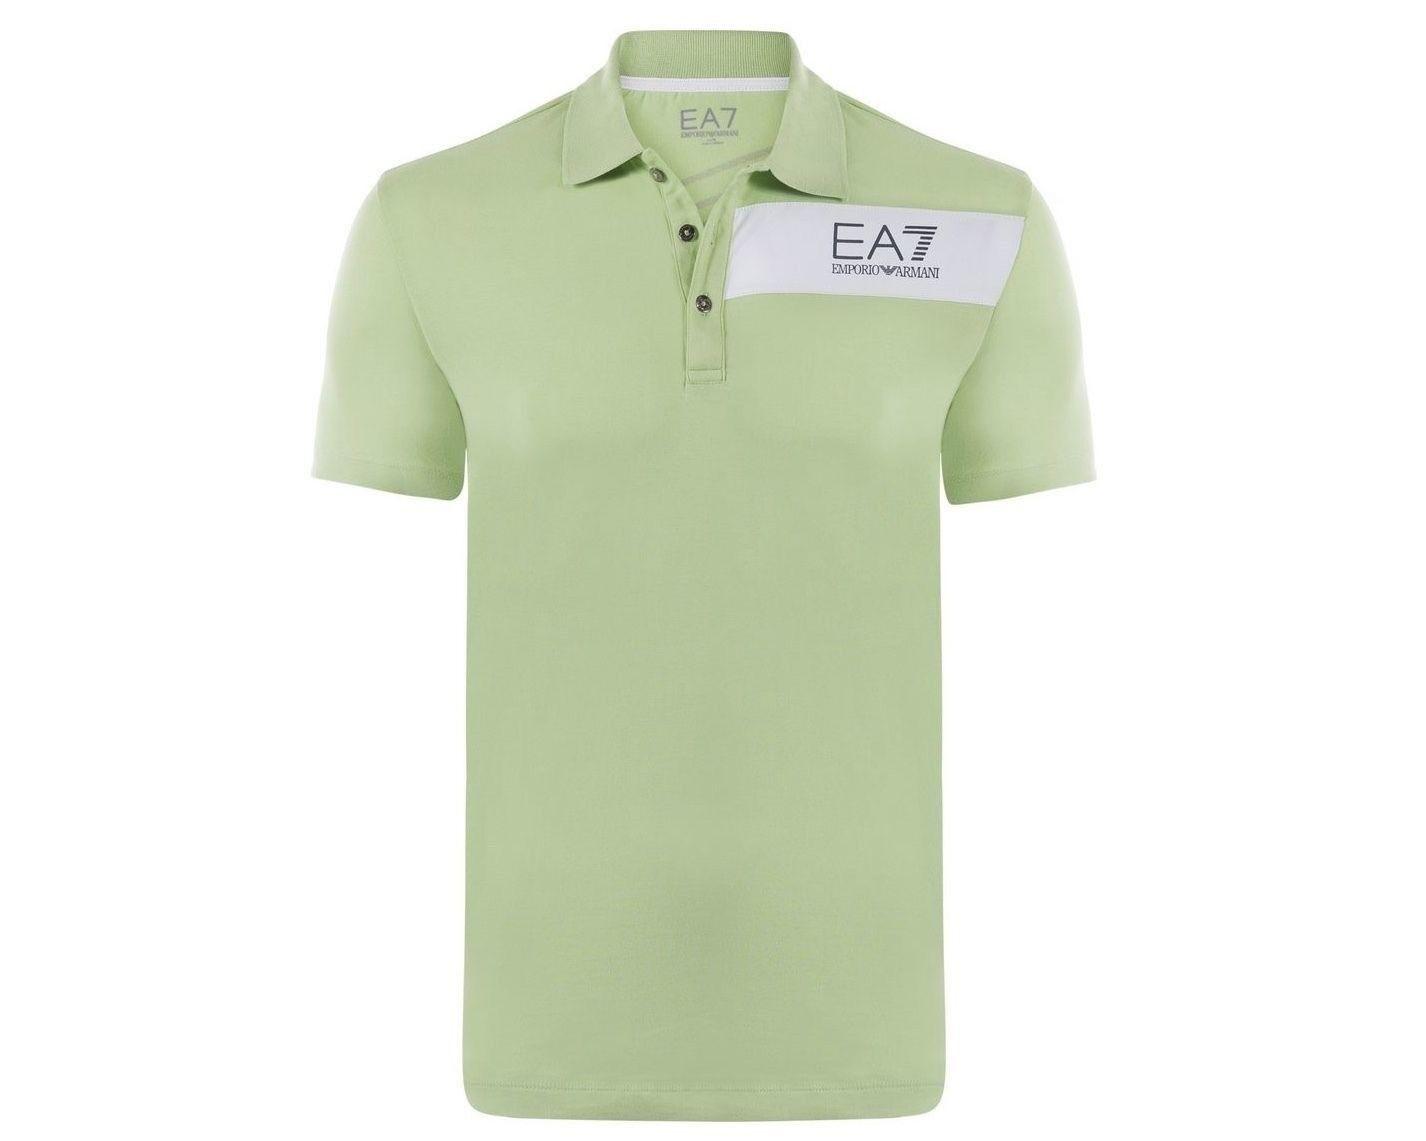 Emporio Armani EA7 Size XL Light Green Polo Shirt Train Evolution Short Sl.